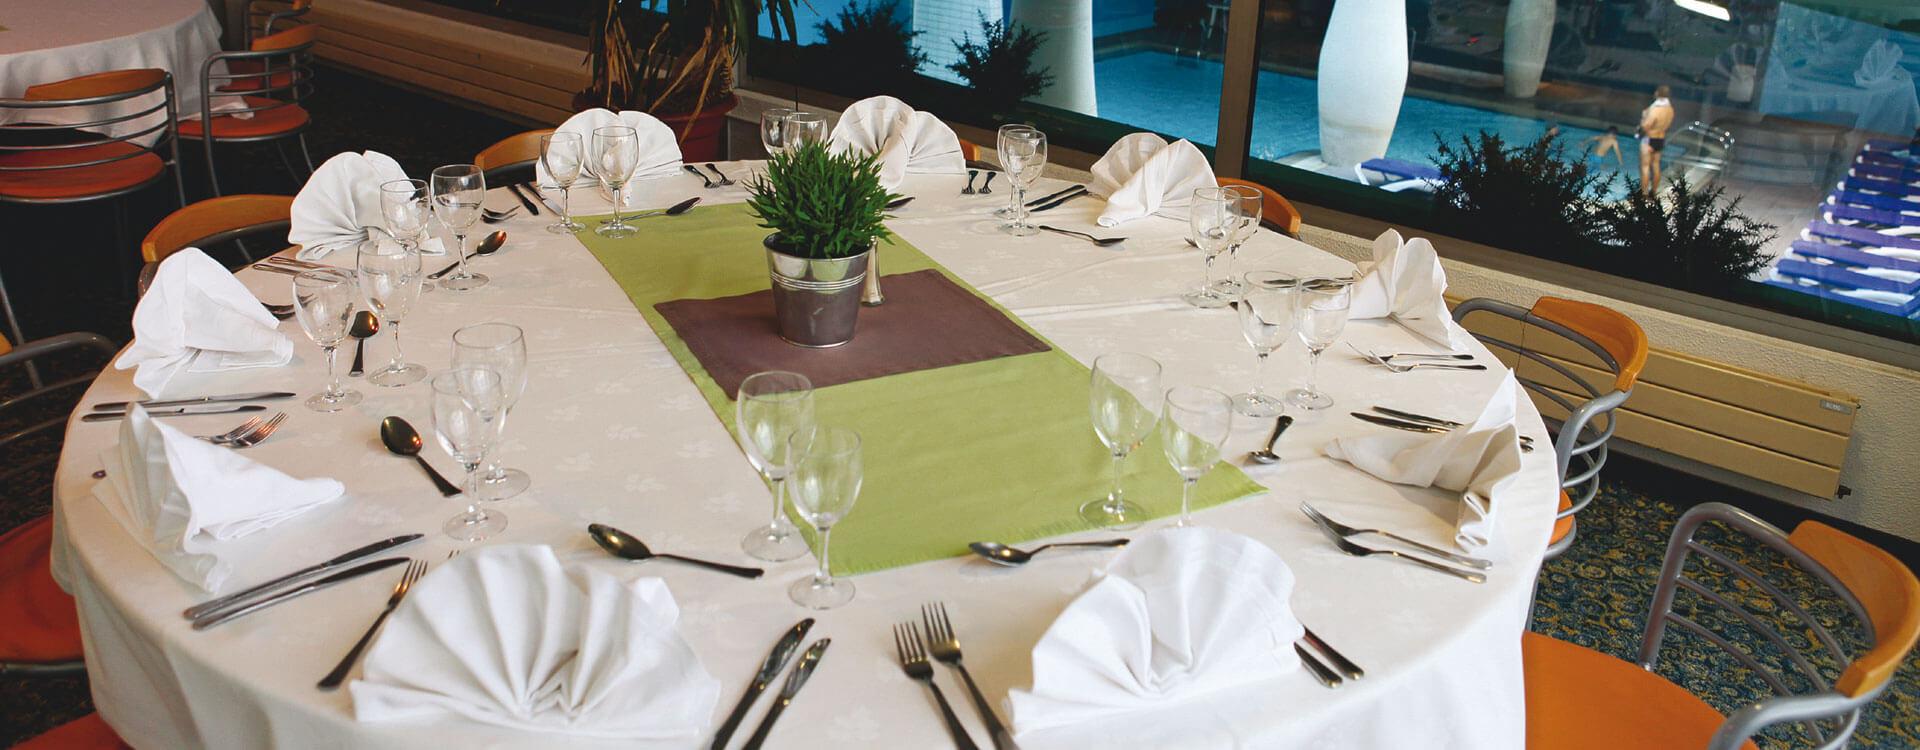 Restaurant - Hôtel *** Les Jardins de l'Atlantique